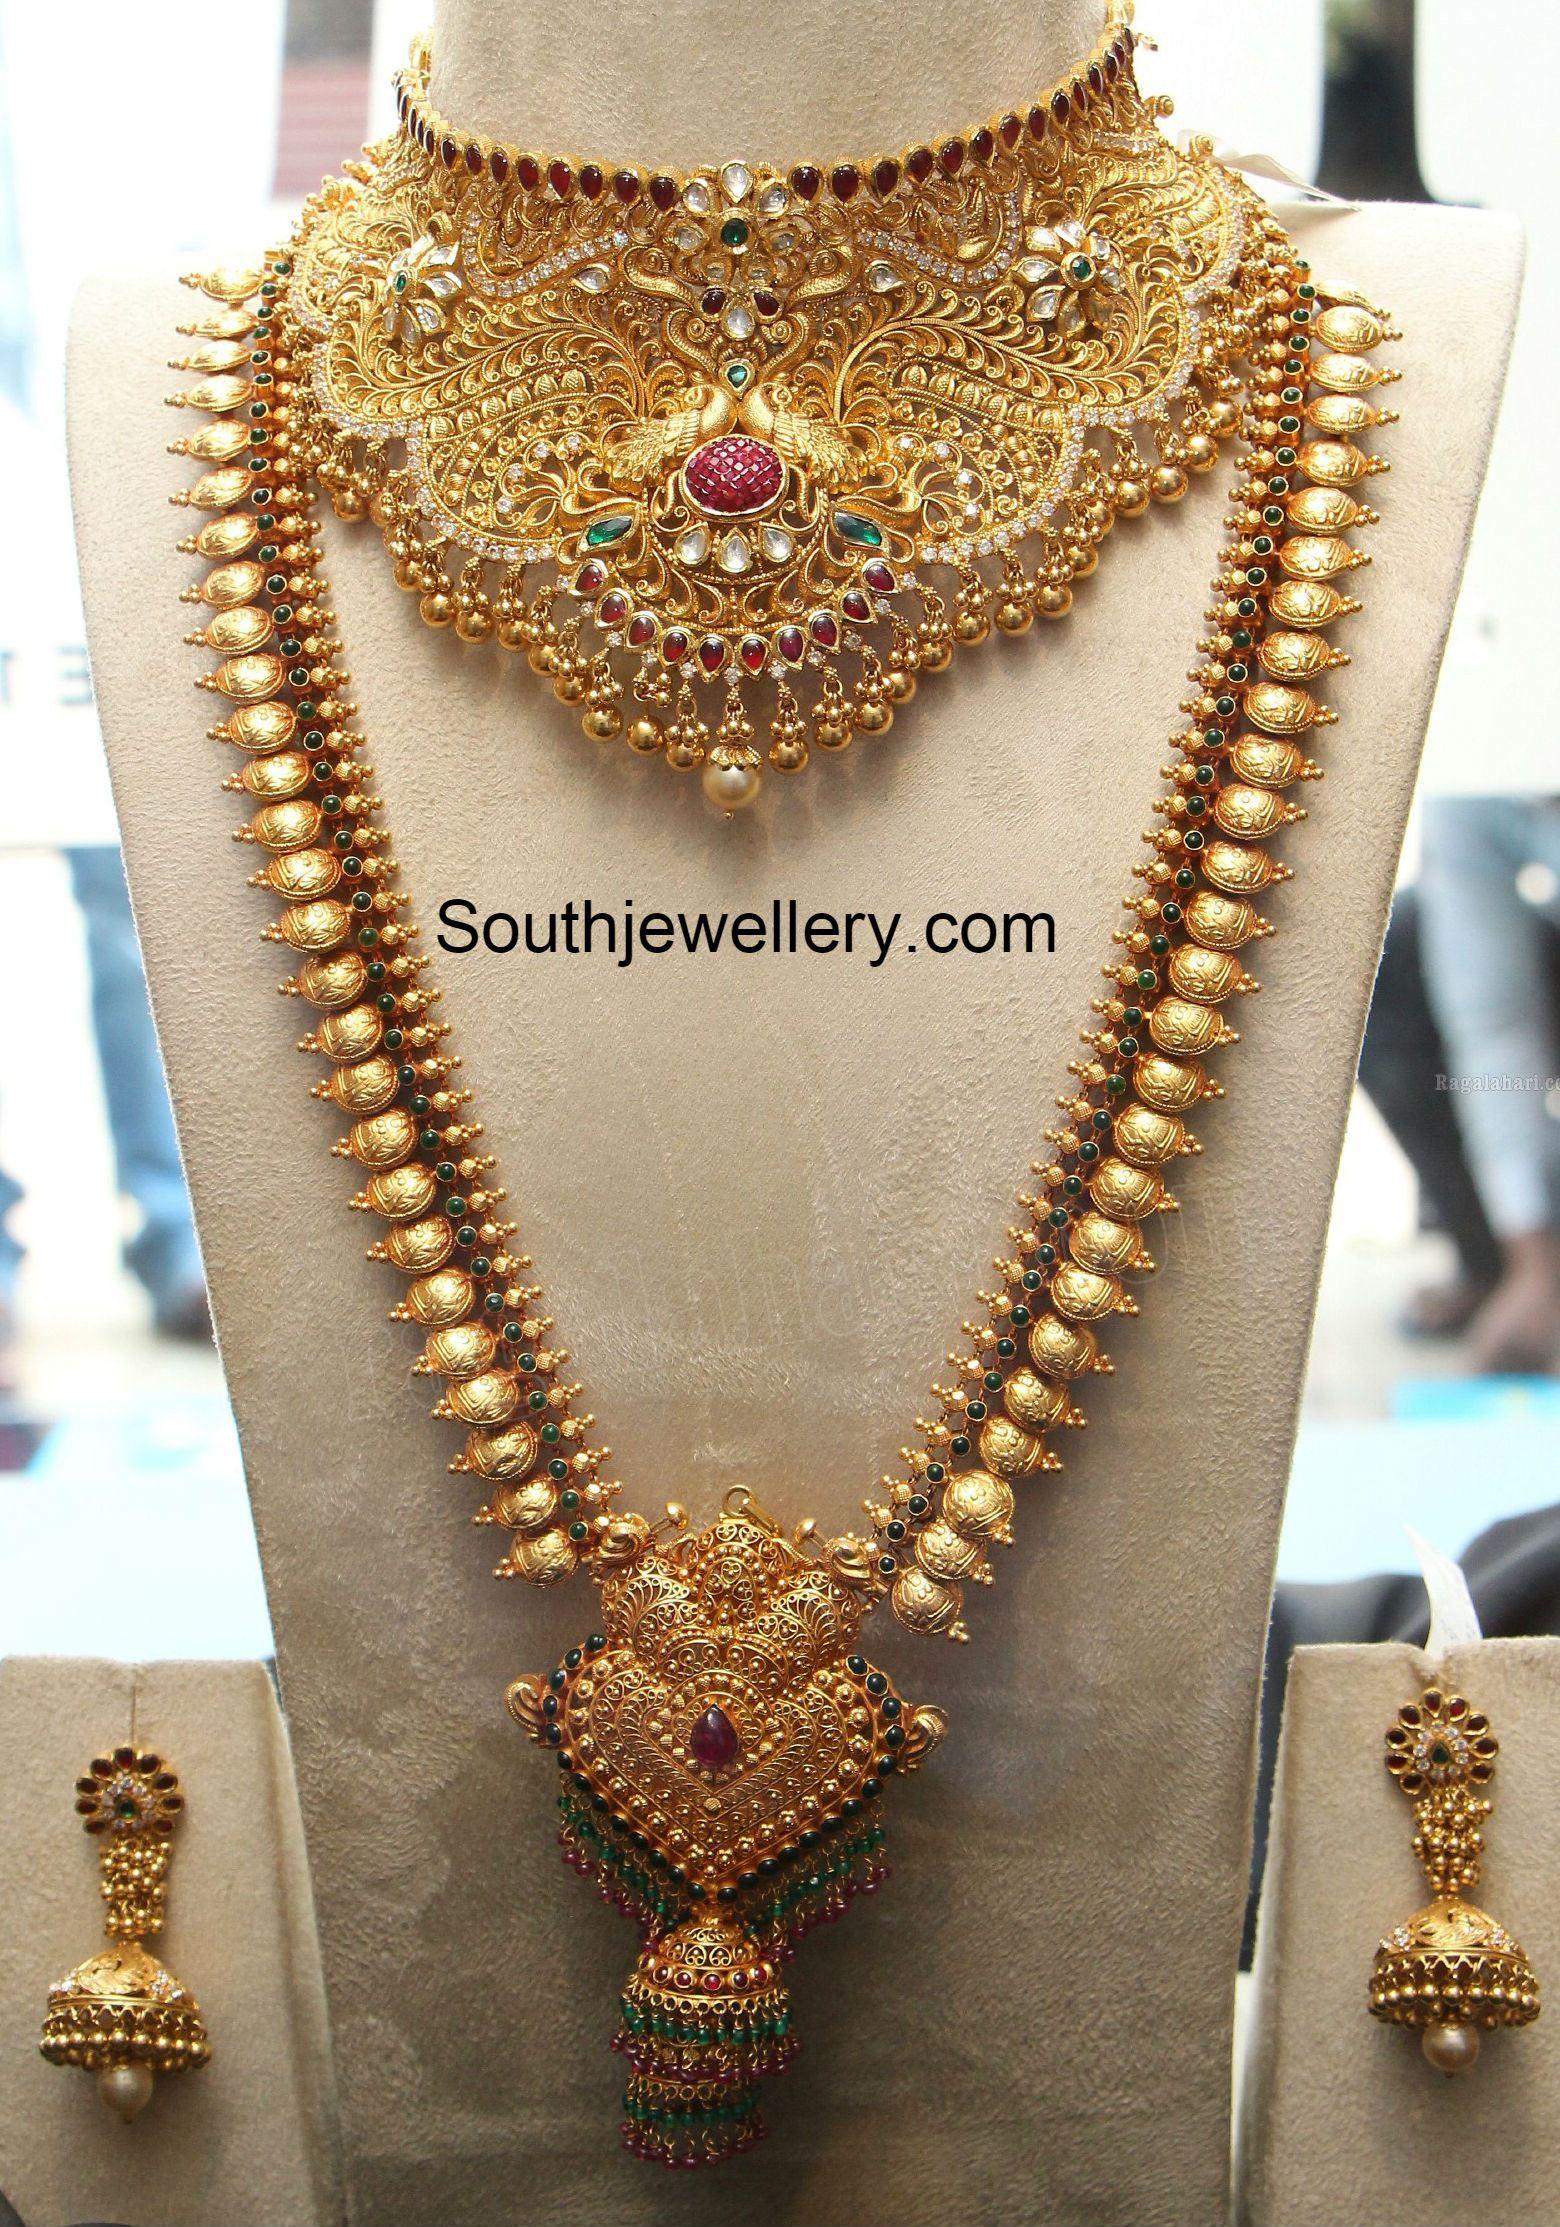 Pin By Jasmine Sylvia On Jewelry In 2019 Diamond Jewelry